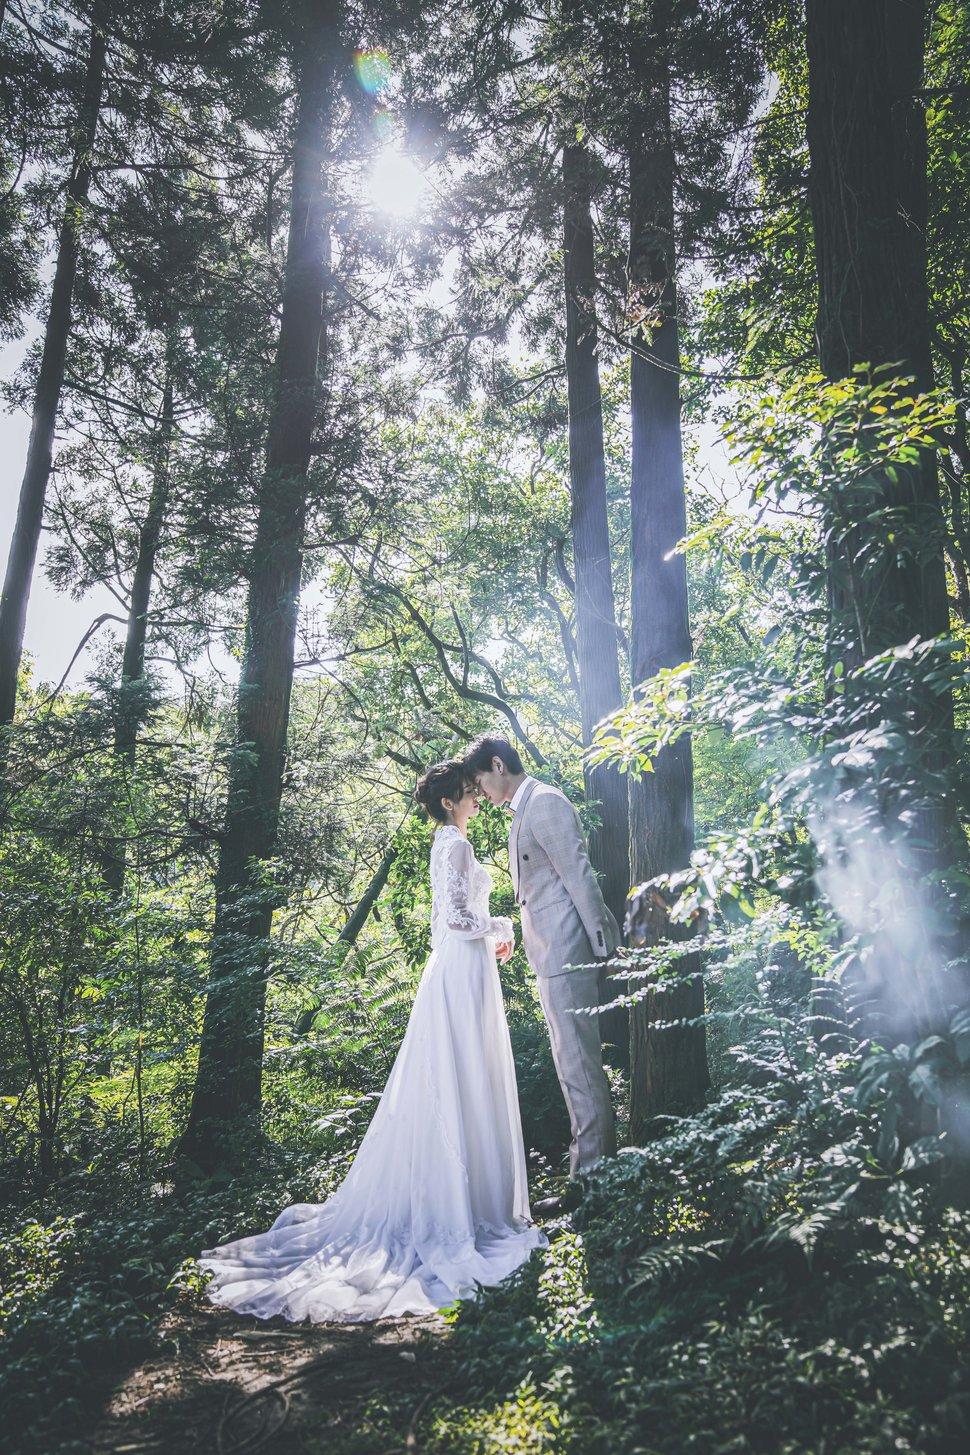 GM_06731 - GM俊彥 uxrw art studio - 結婚吧